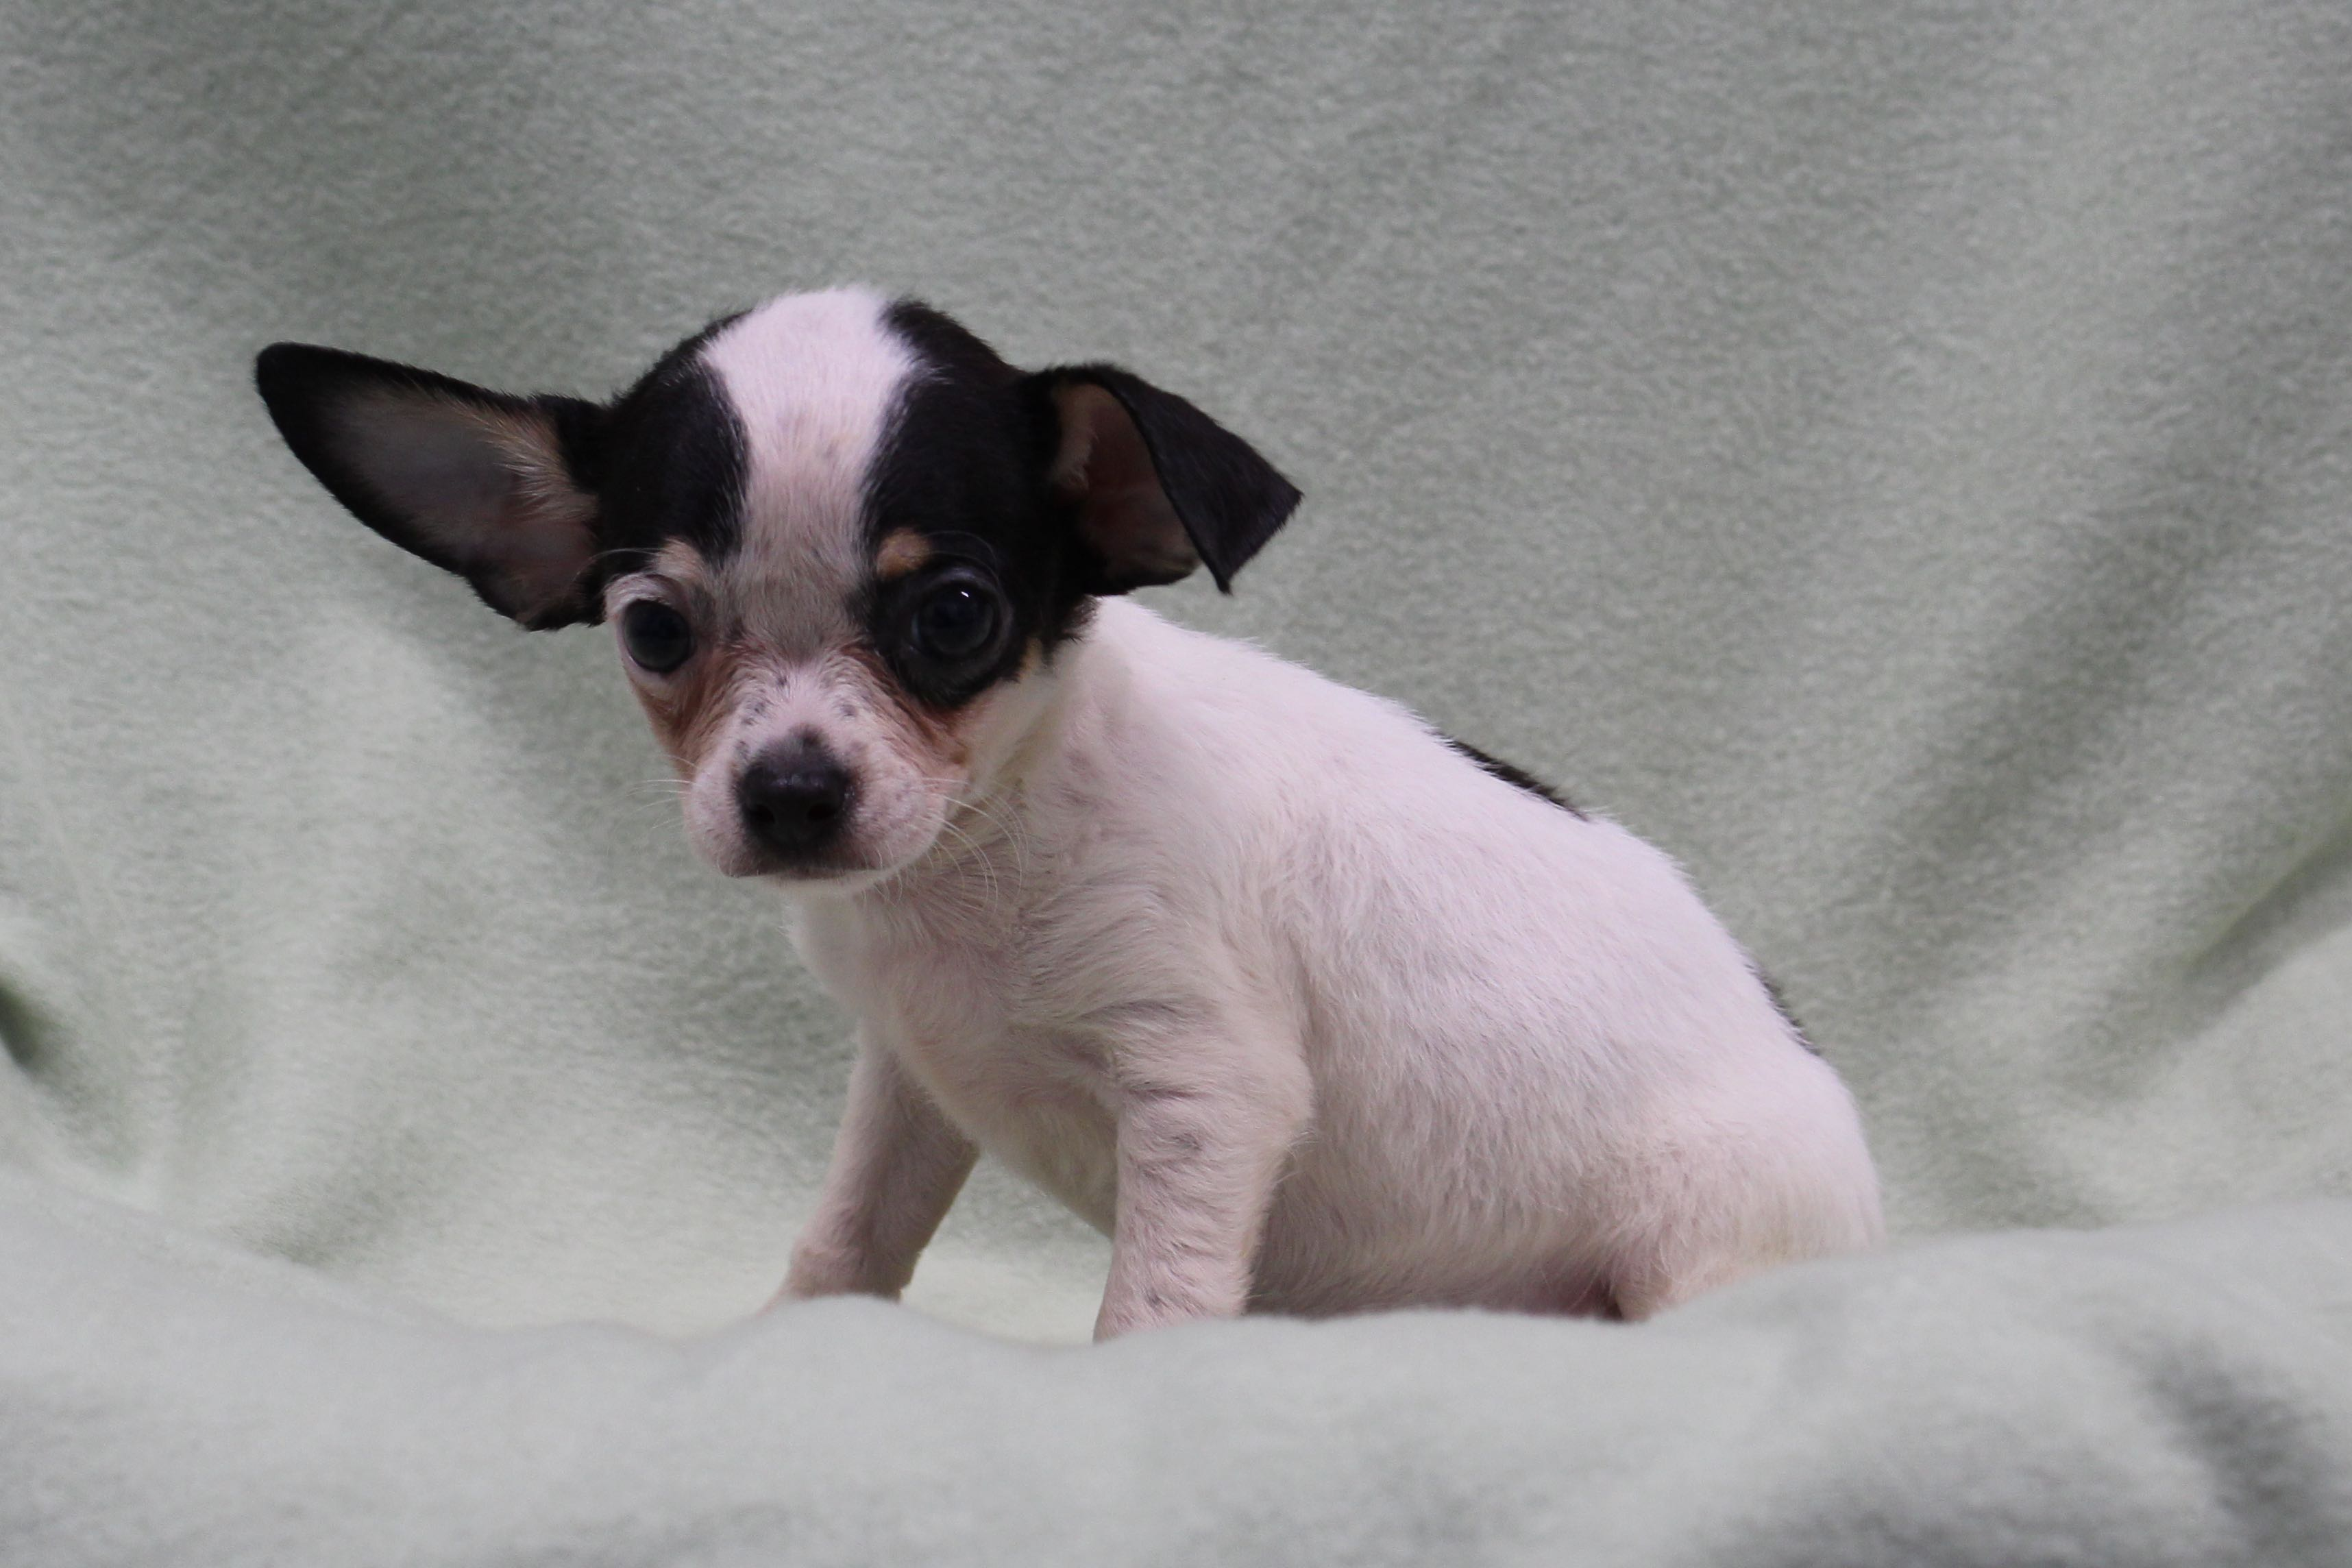 ChihuahuaBlue3817